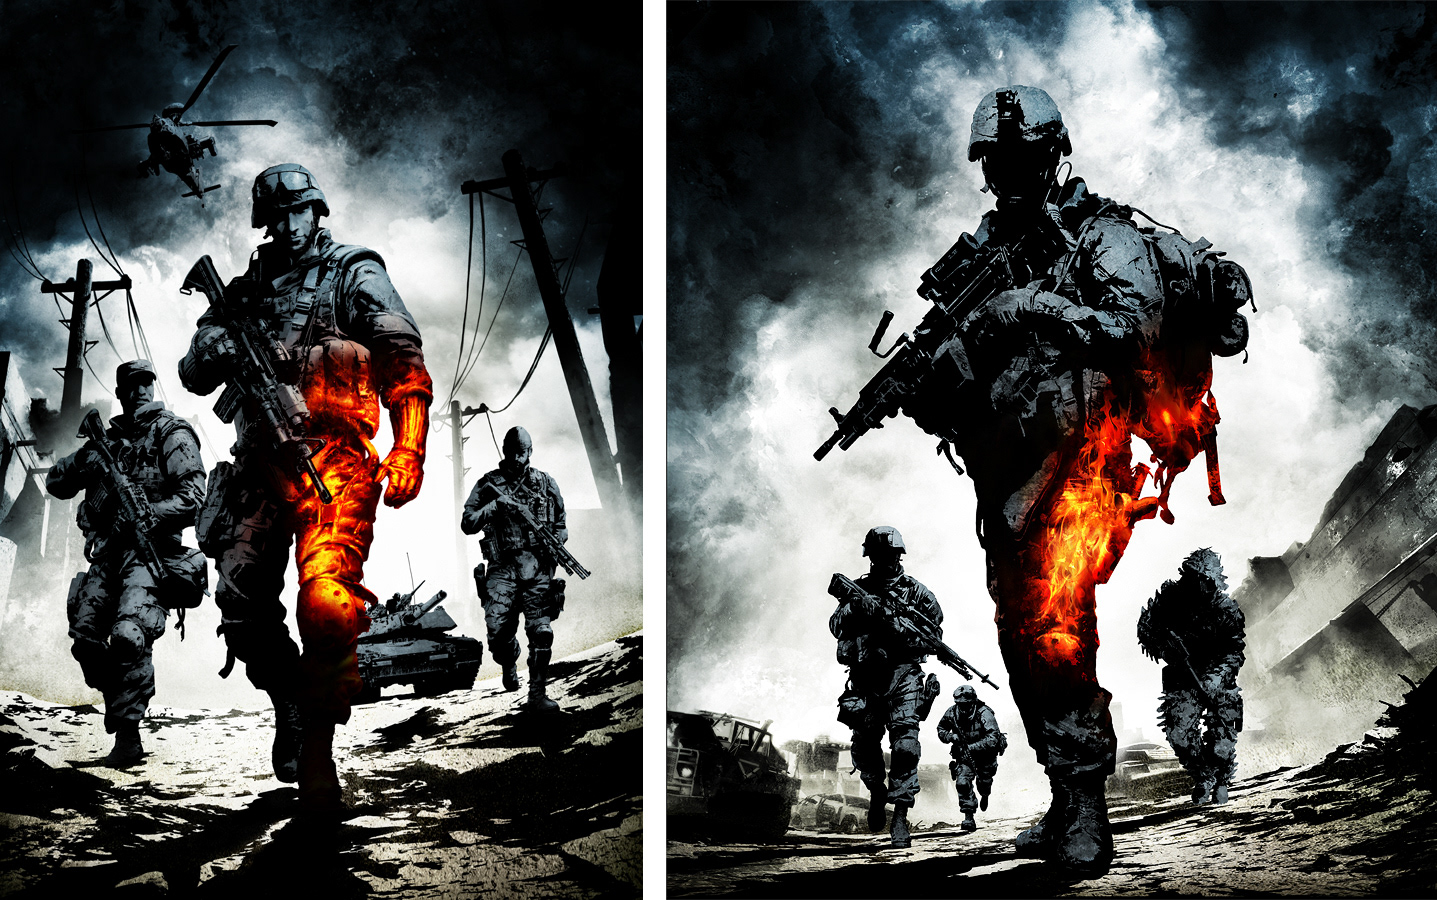 Robert Sammelin Artworks Battlefield Bad Company 2 Key Art